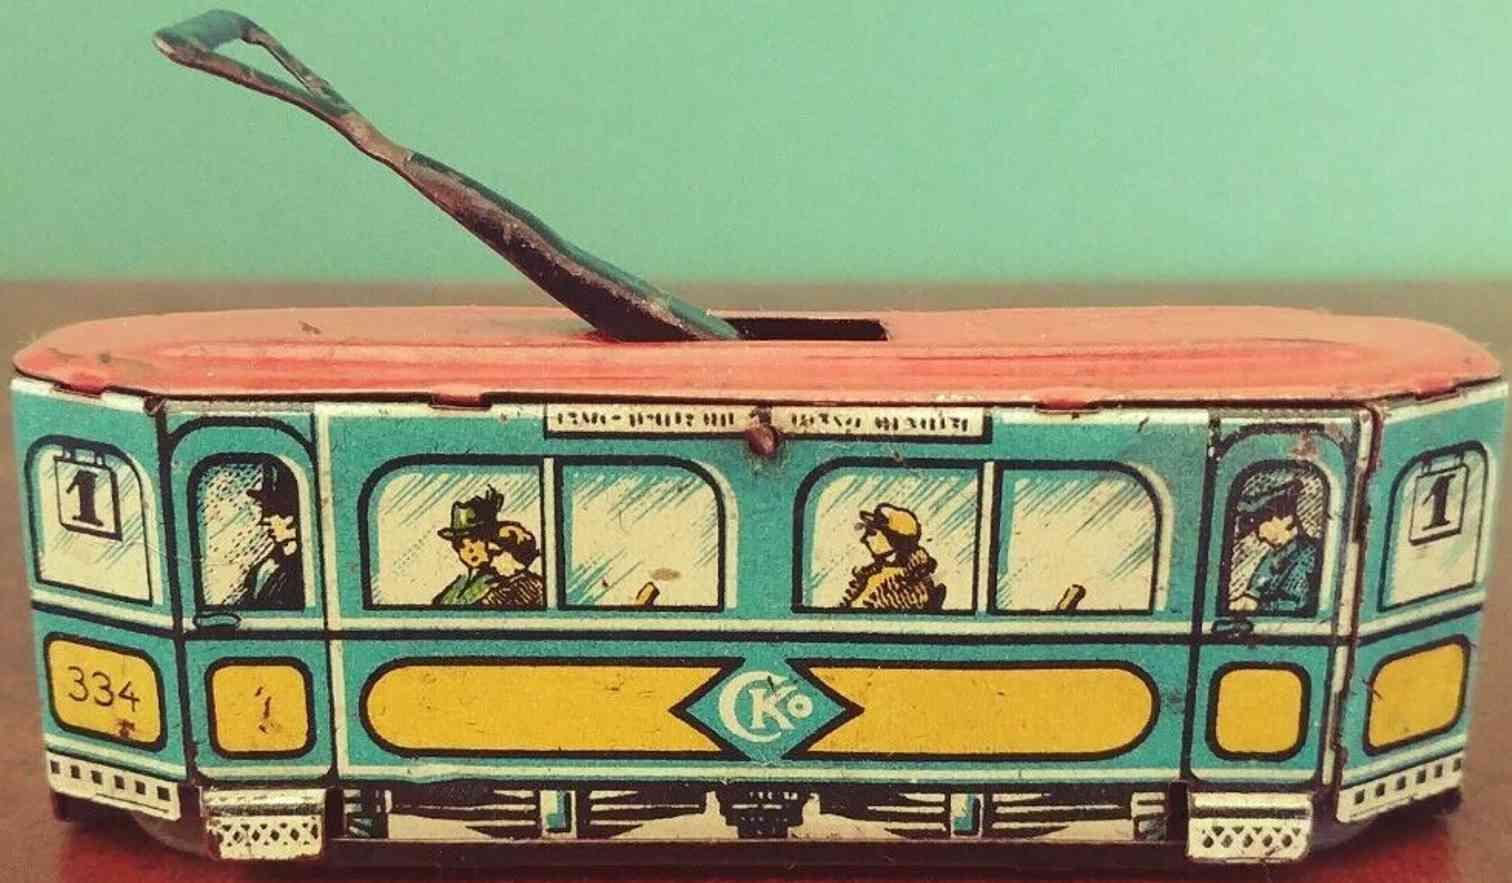 kellermann 334 penny toy strassenbahn mit uhrwerk